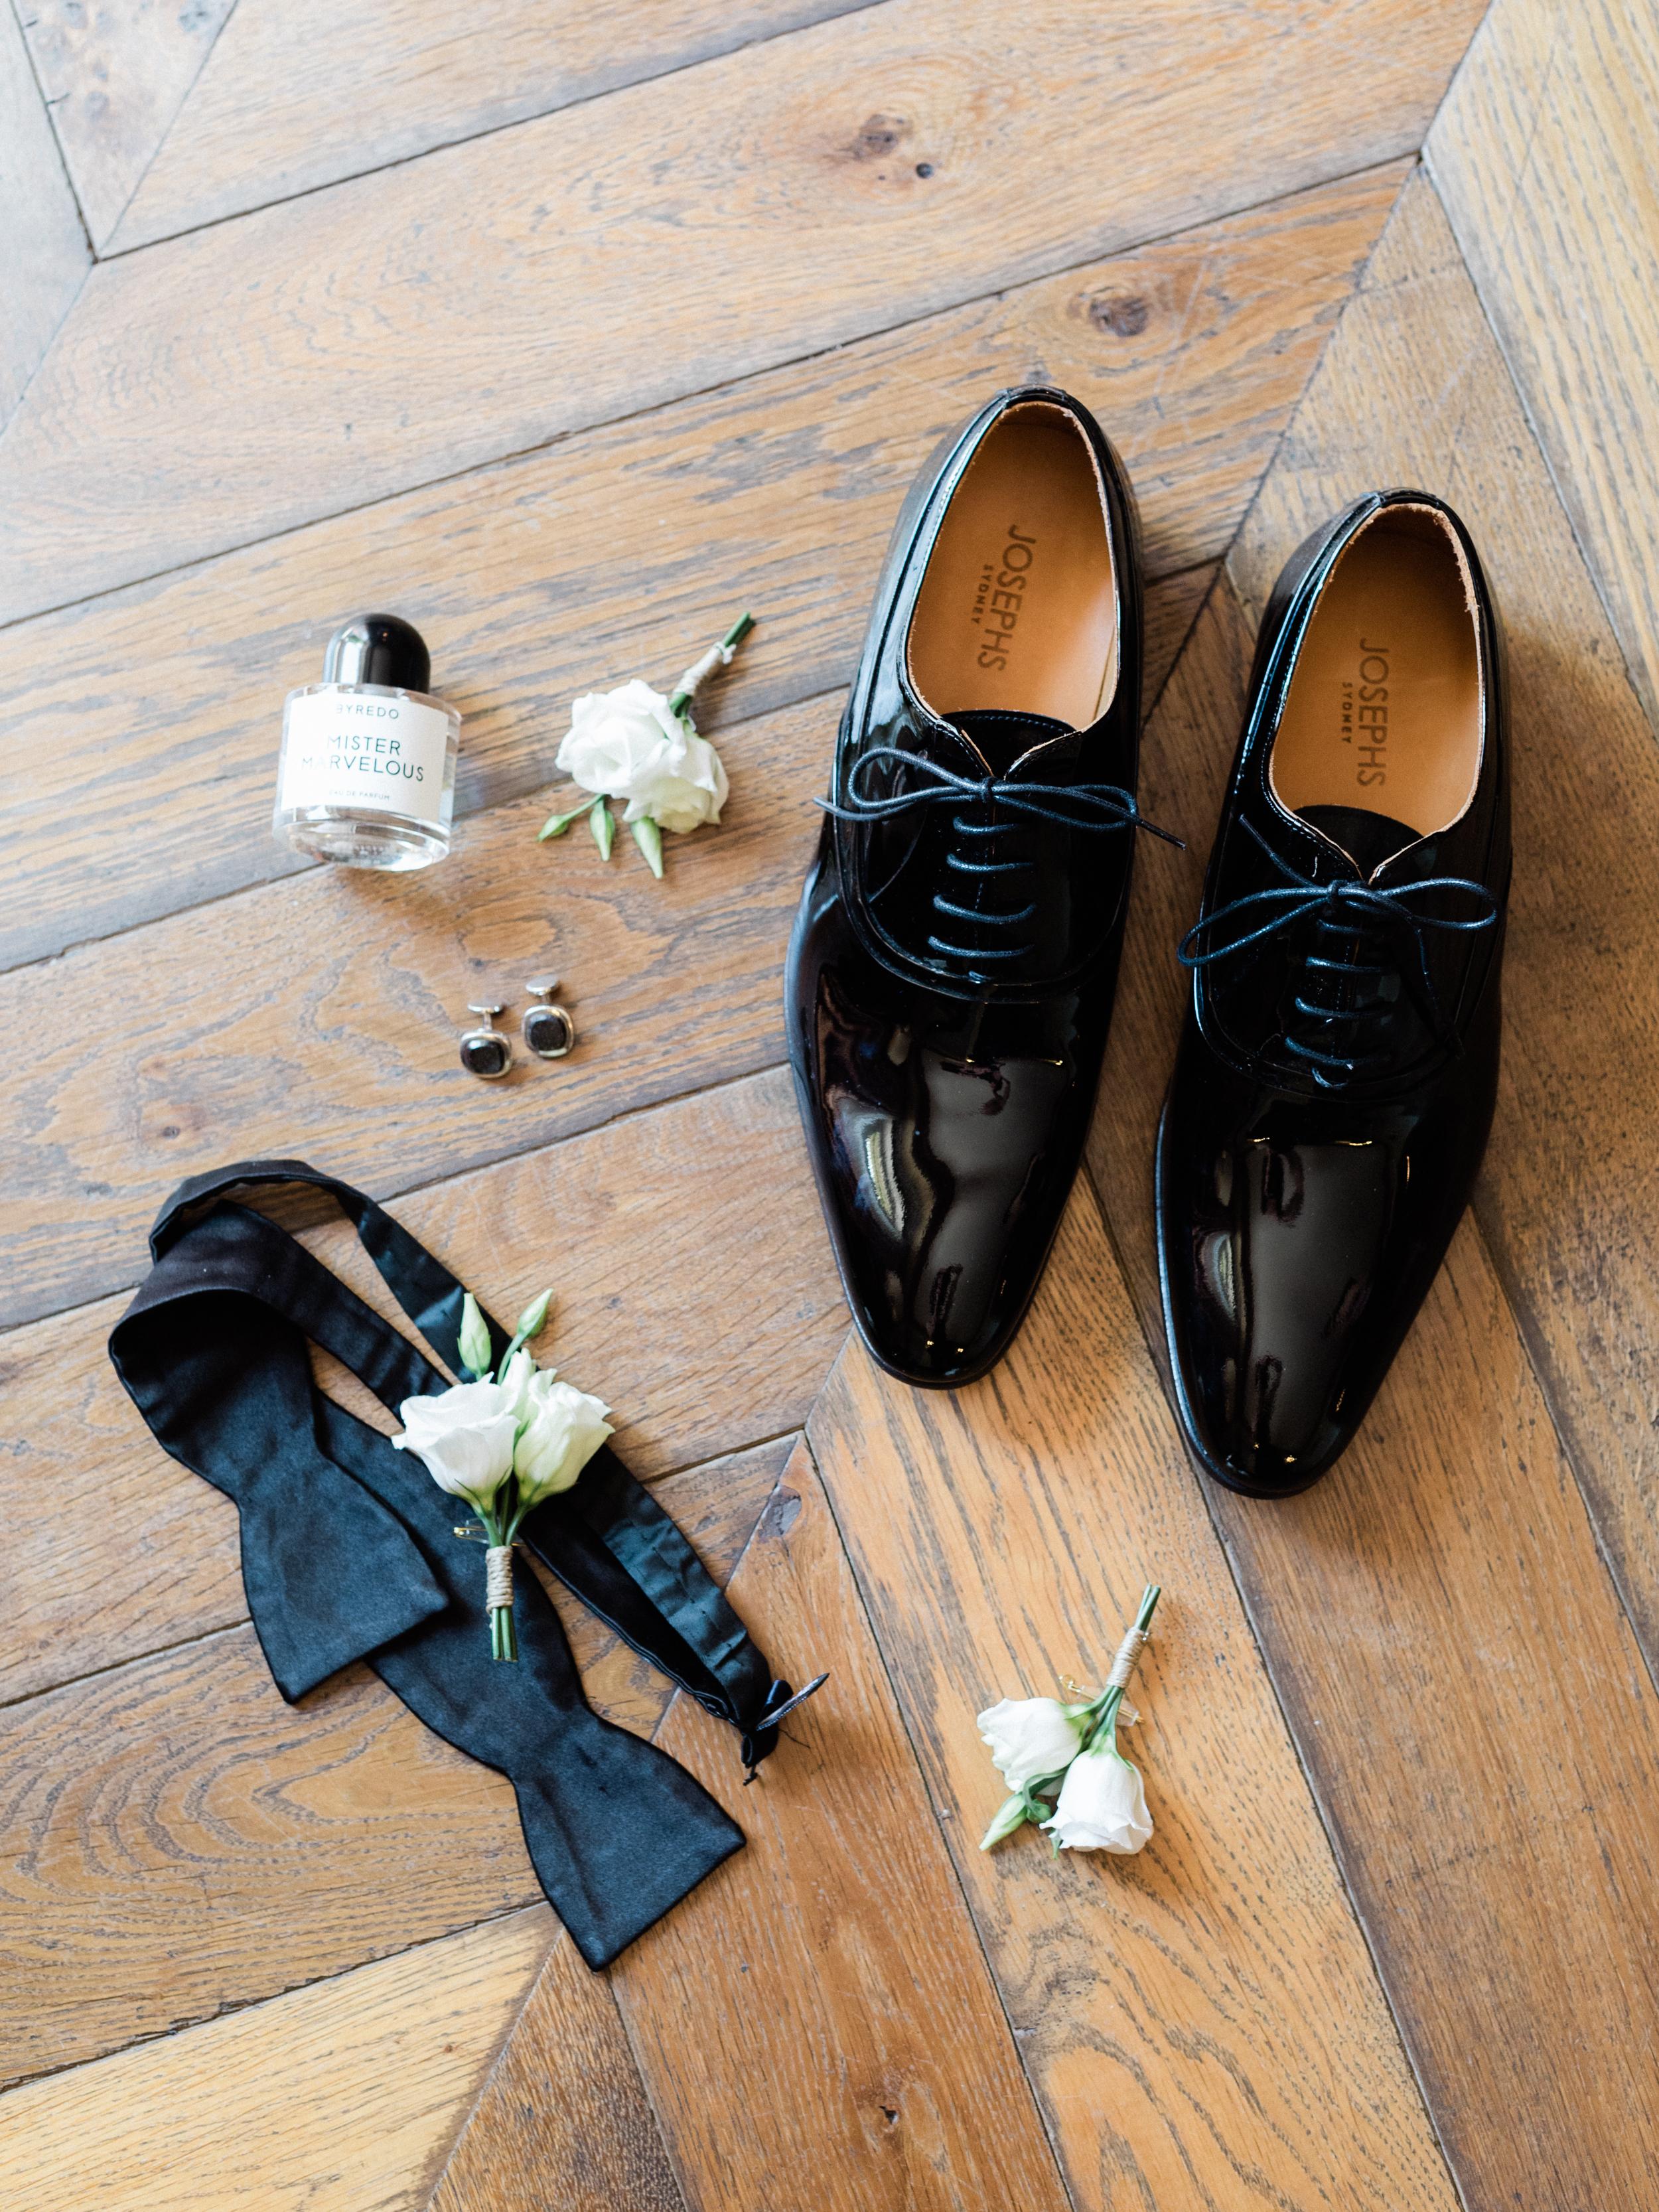 bastide_de_gordes_provence_wedding_(c)_rory-wylie-4.jpg